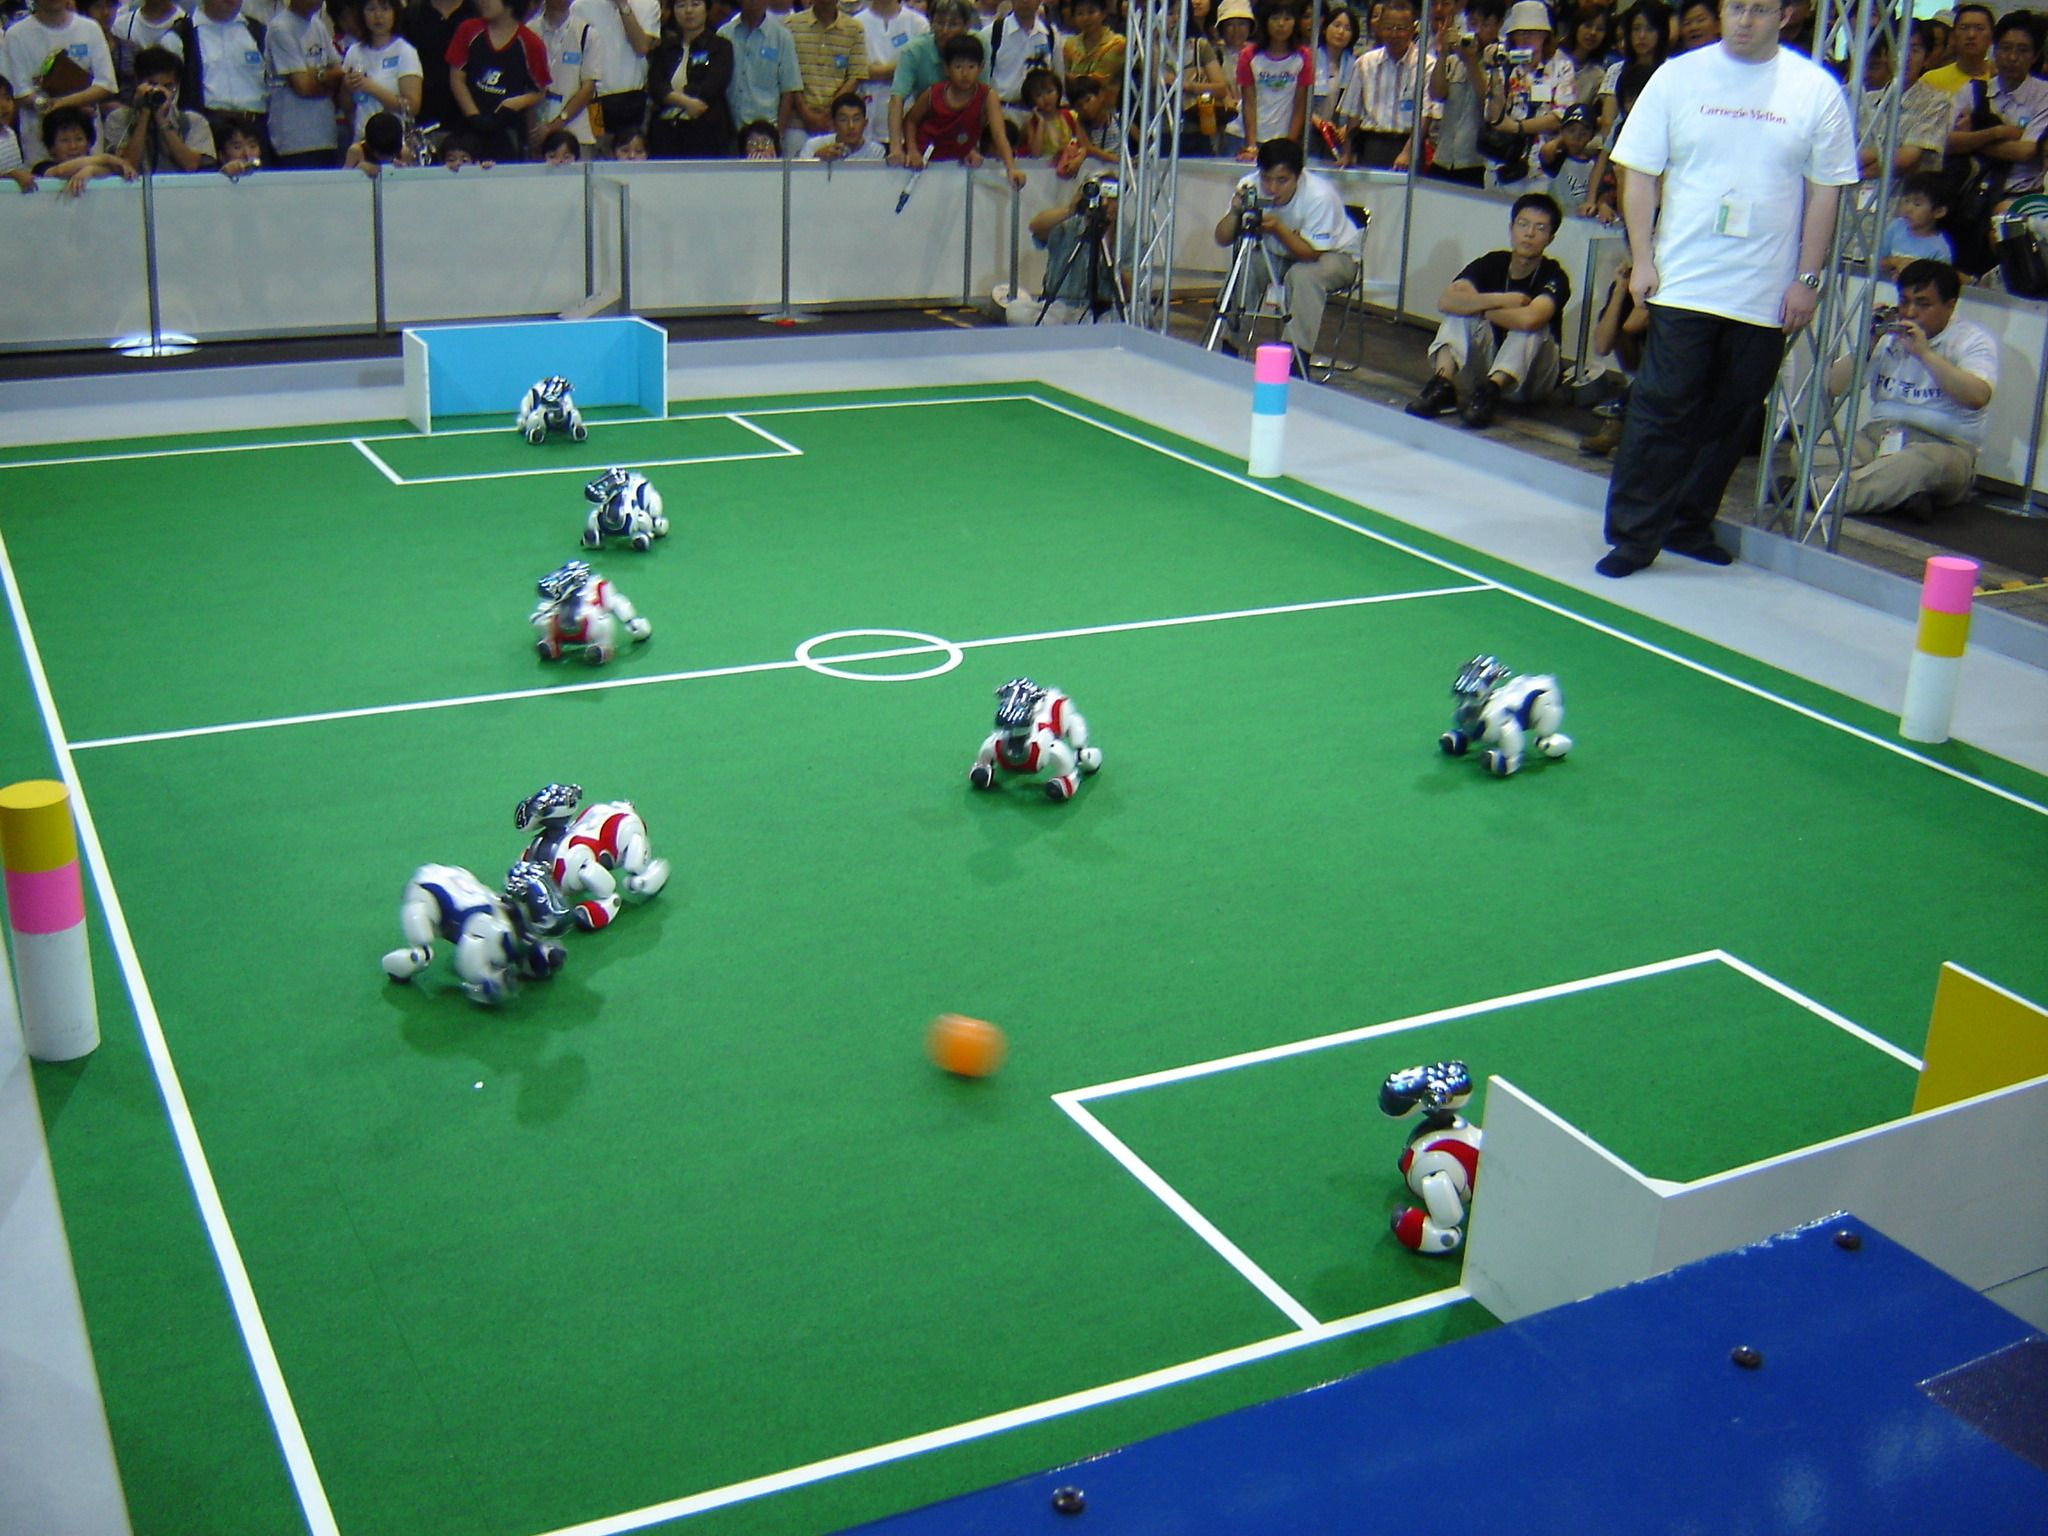 AIBO-er spiller fotball i RoboCup 2005 i Japan. Foto: Learza, CC-BY-SA-2.0